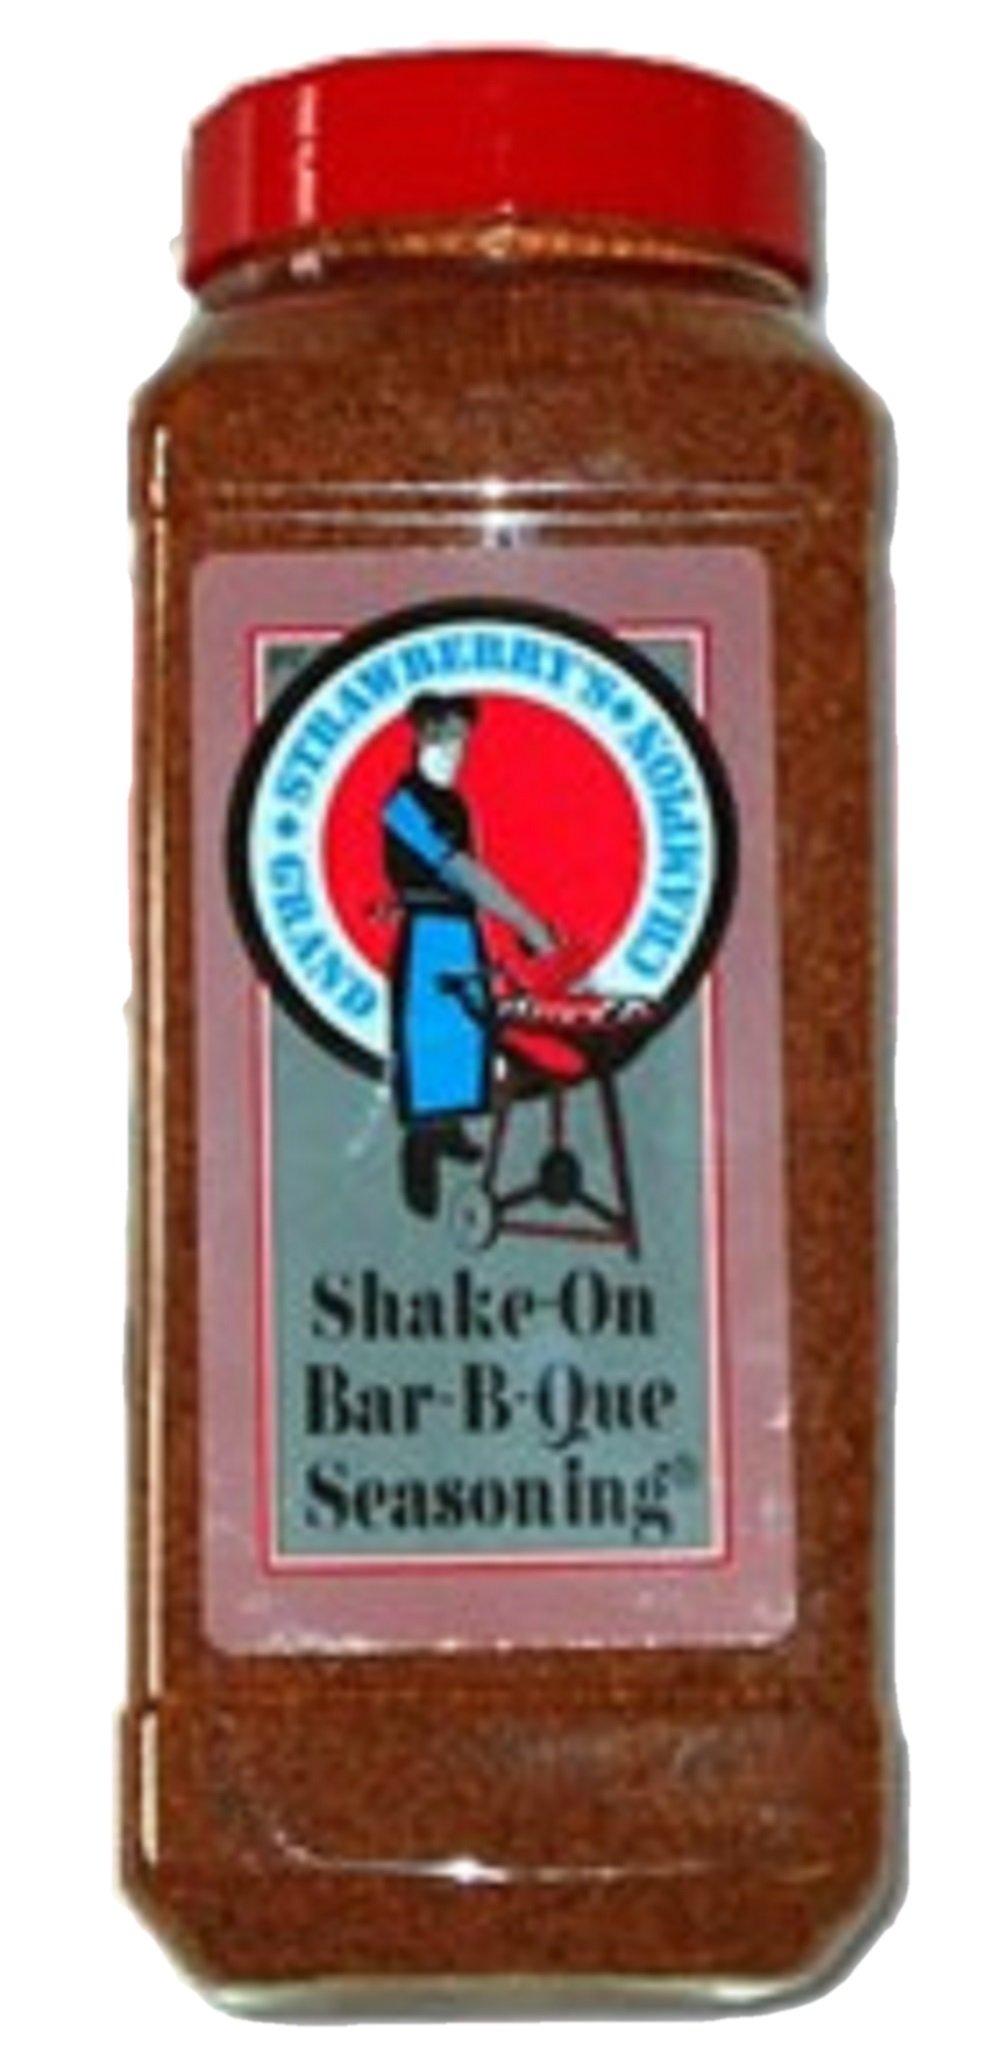 Strawberry's Grand Champion Shake-On Bar-B-Que Seasoning (24 oz.)